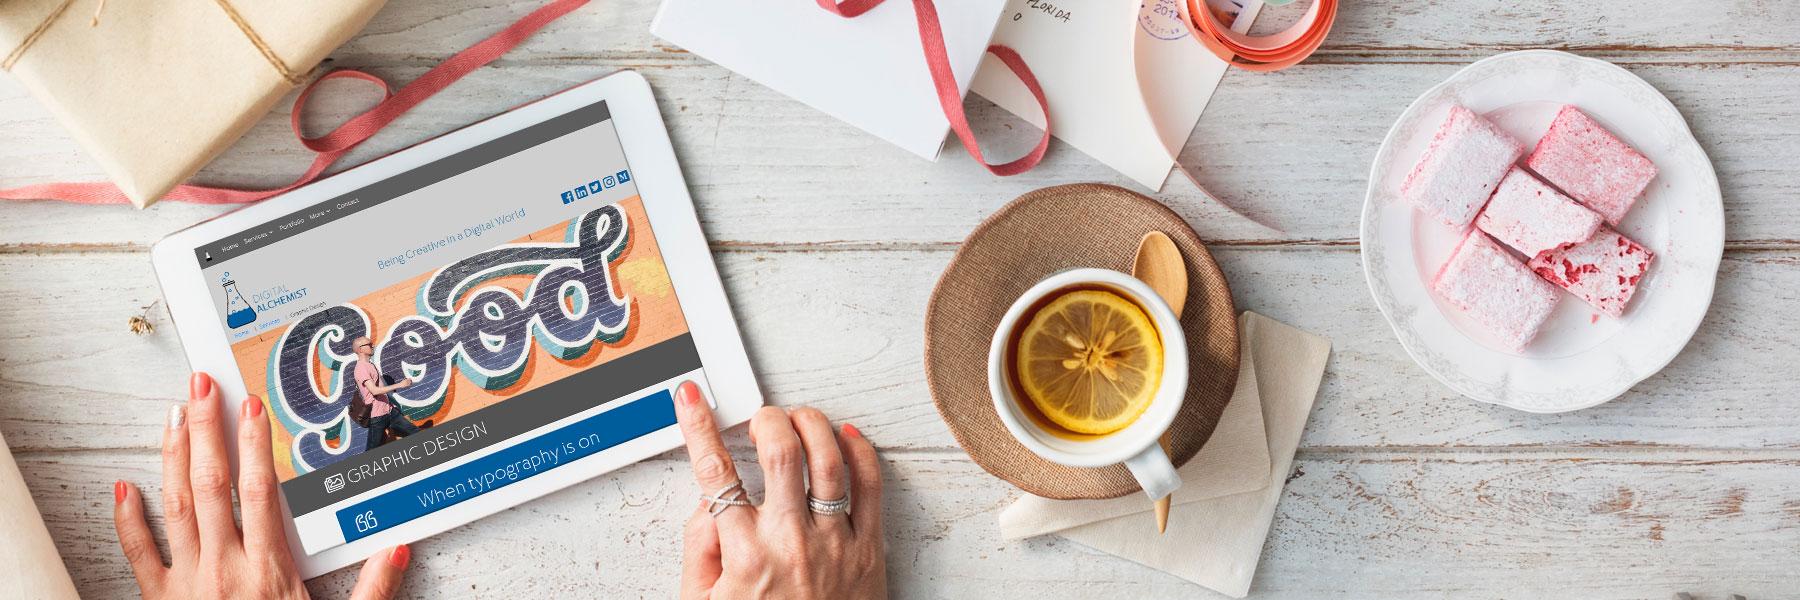 Digital Alchemist - Creative Portfolio | The Digital Alchemist | A digital creative for graphic, social & web design and visual media